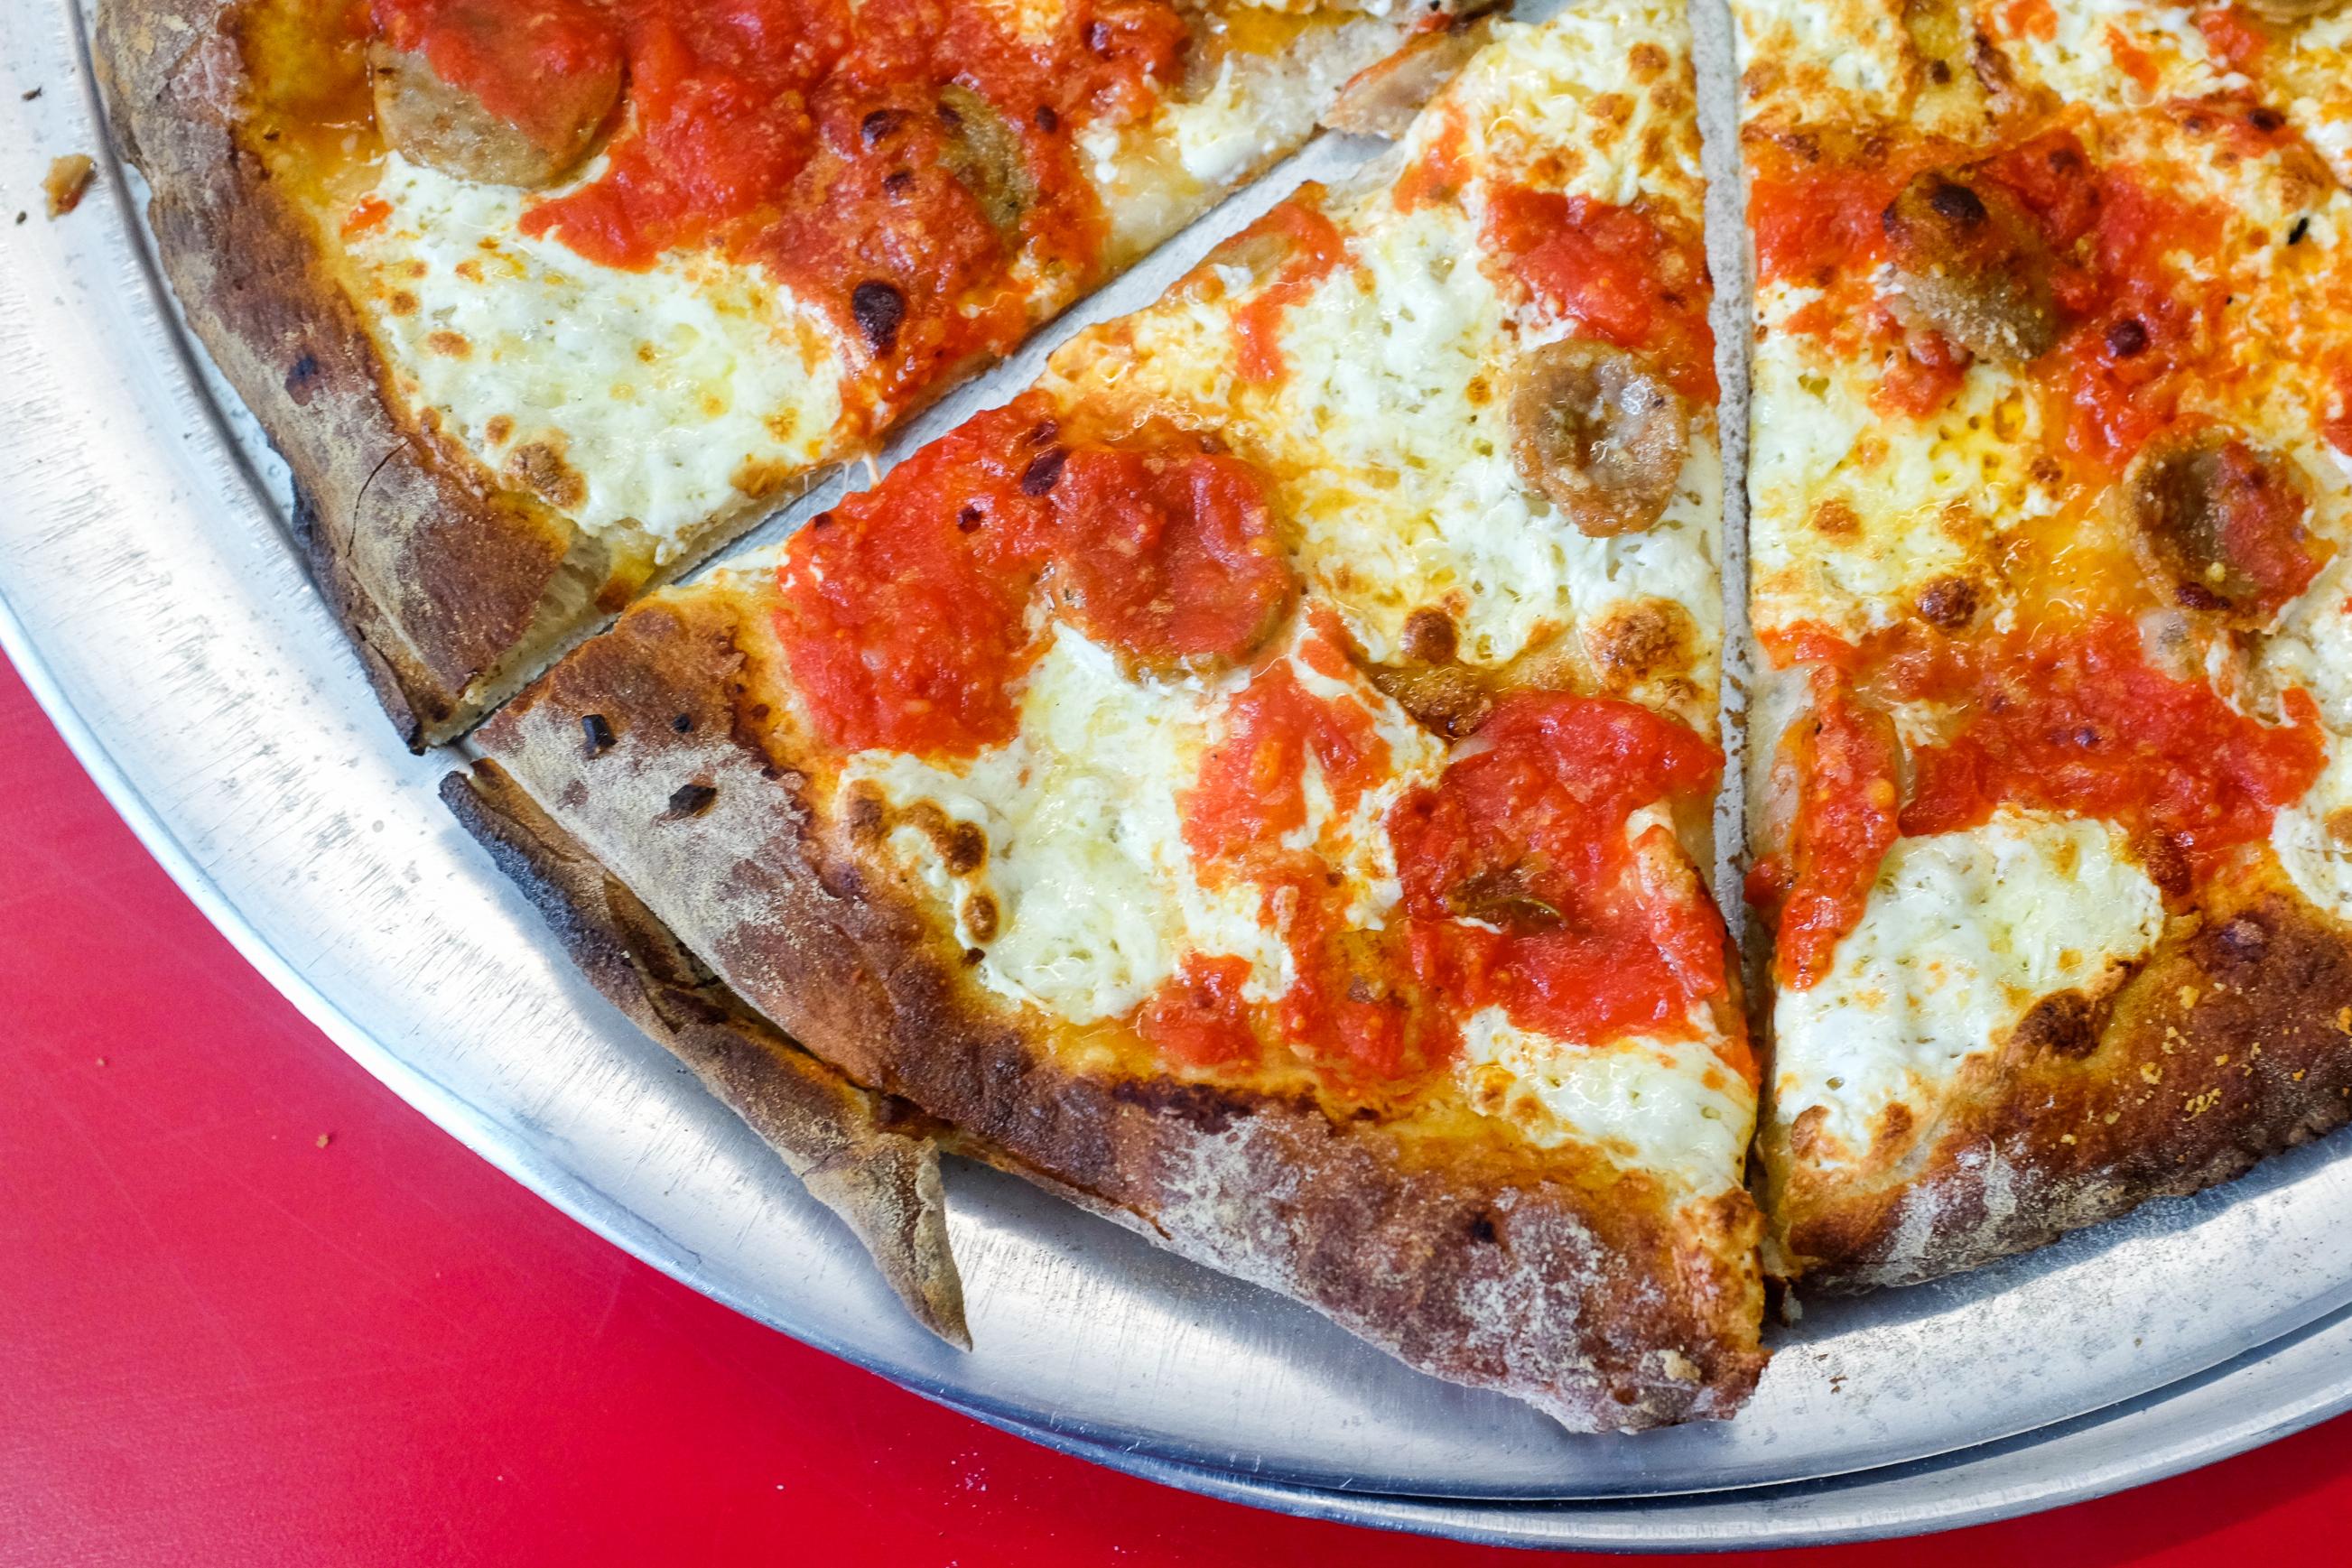 totonnos_pizza2.0.0.jpg